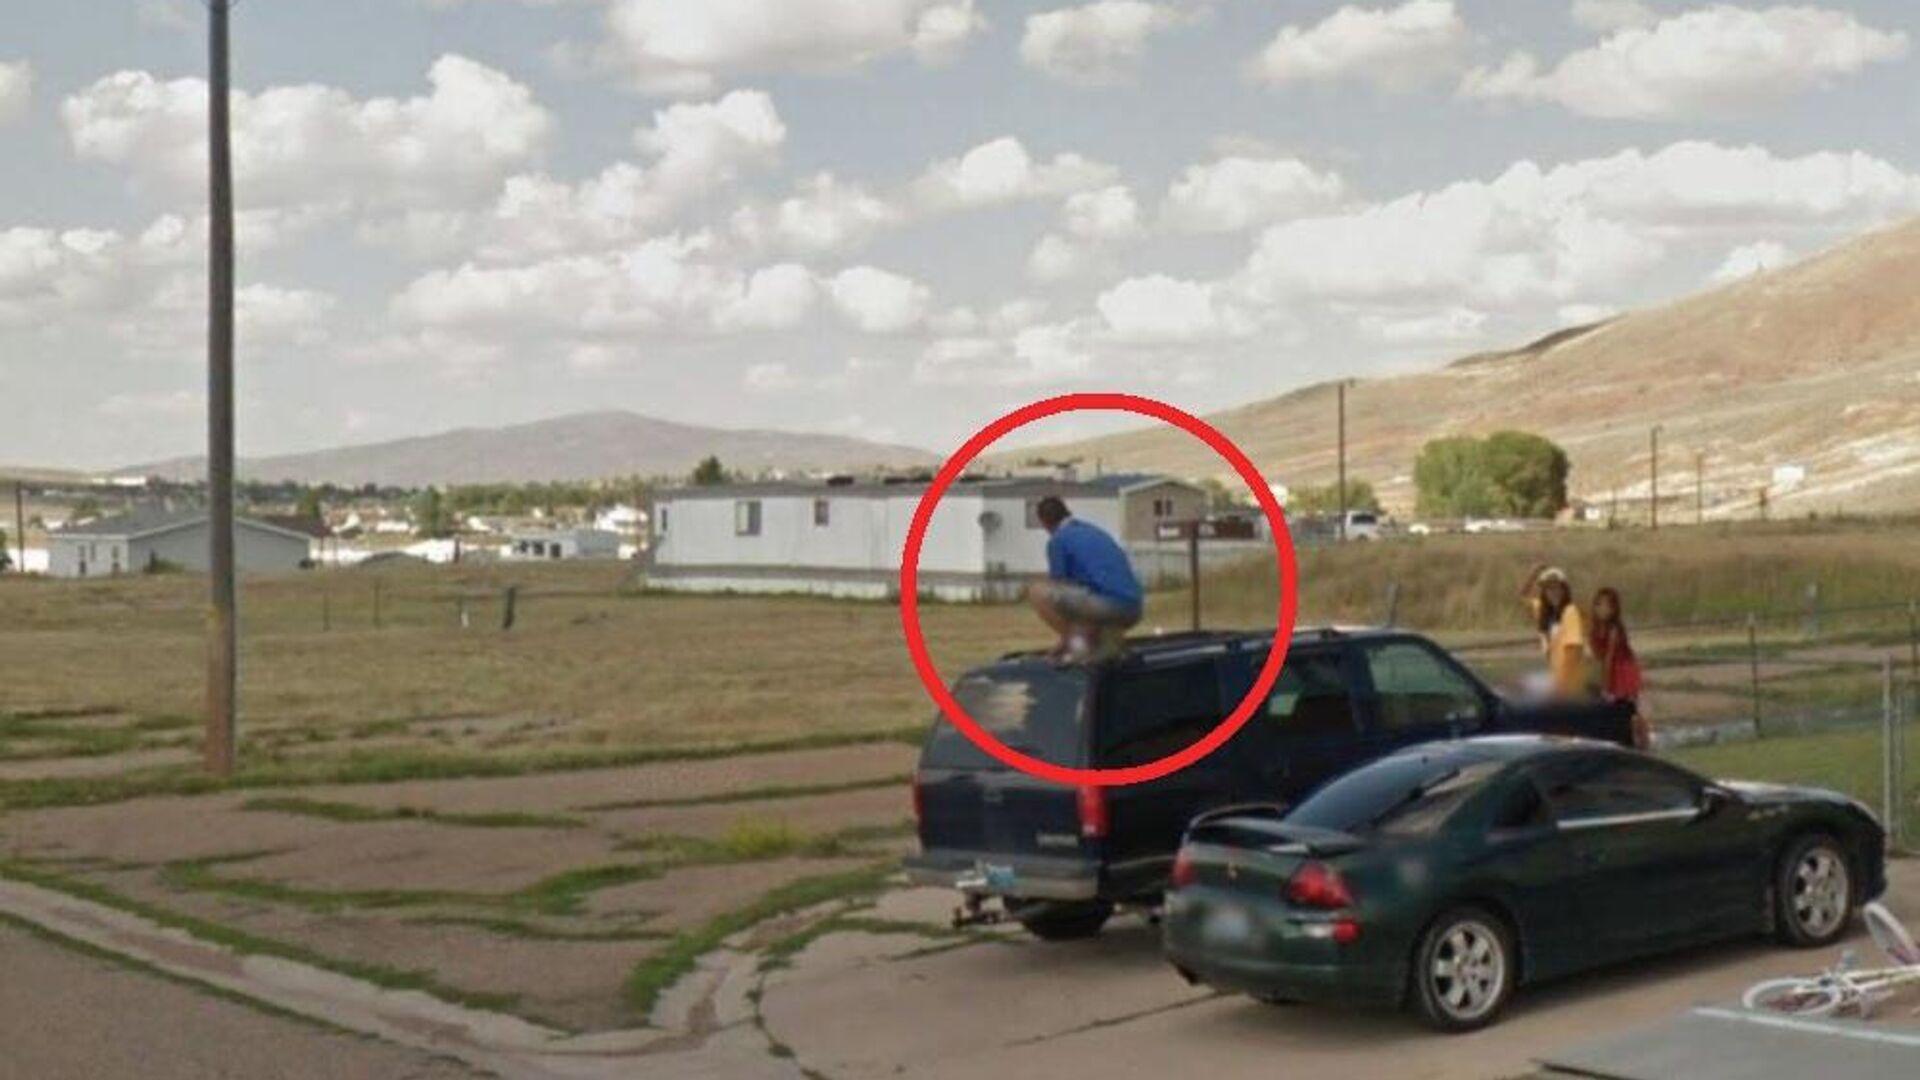 Google Maps: Άντρας μοιάζει να αφοδεύει επάνω στην οροφή τζιπ - Sputnik Ελλάδα, 1920, 26.09.2021